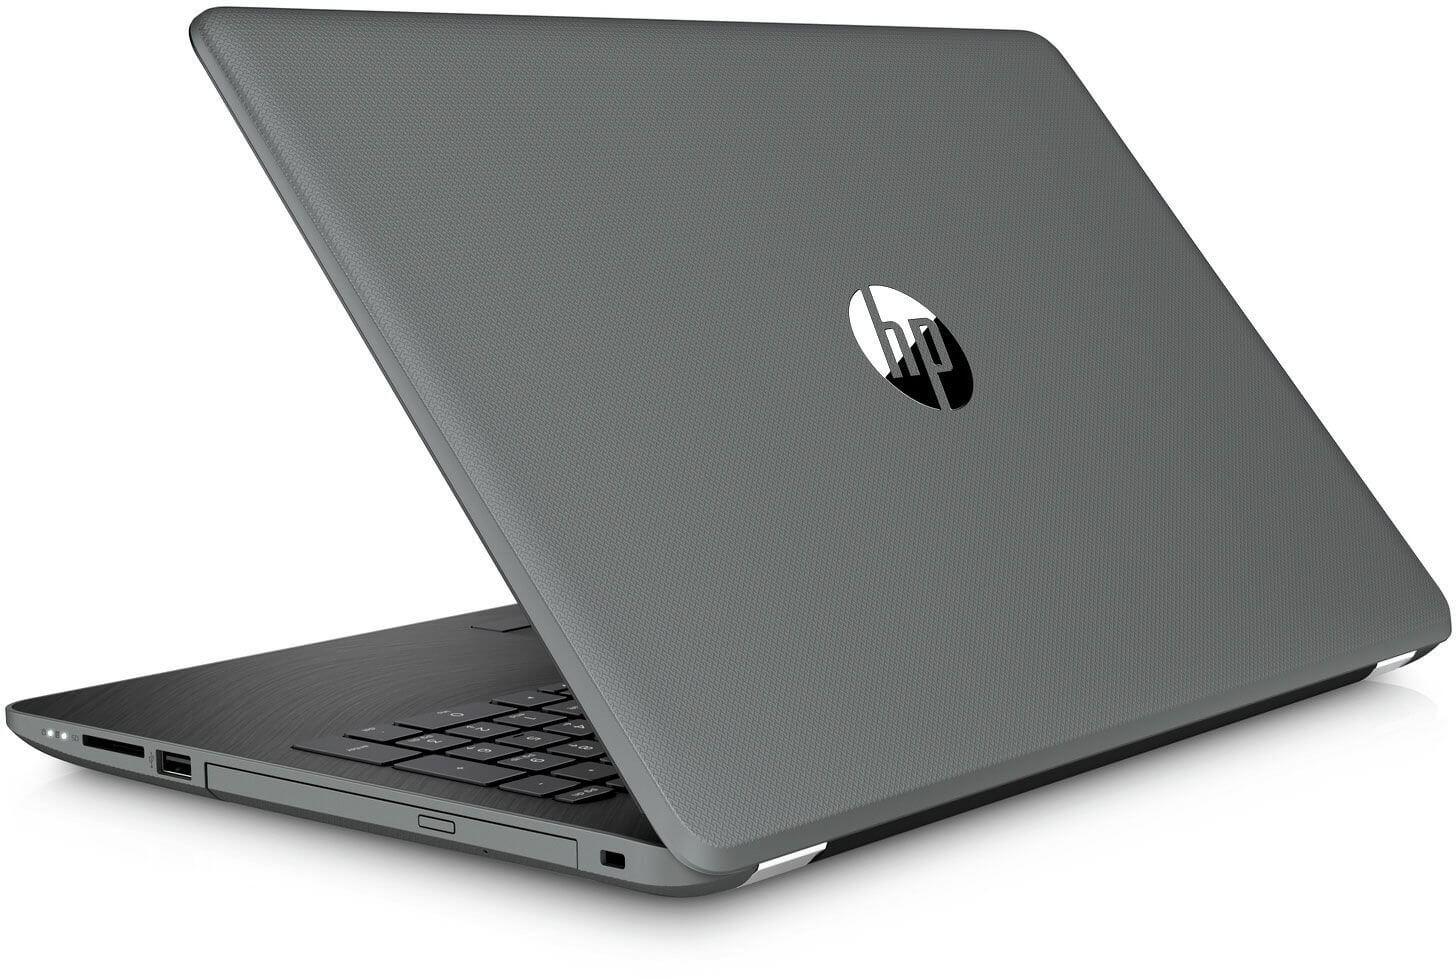 hp laptops, best hp laptop under 30000, best laptops under 30000, HP laptop, Acer Laptop, Lenovo laptop, dell laptop, best laptop, best laptop under 30000